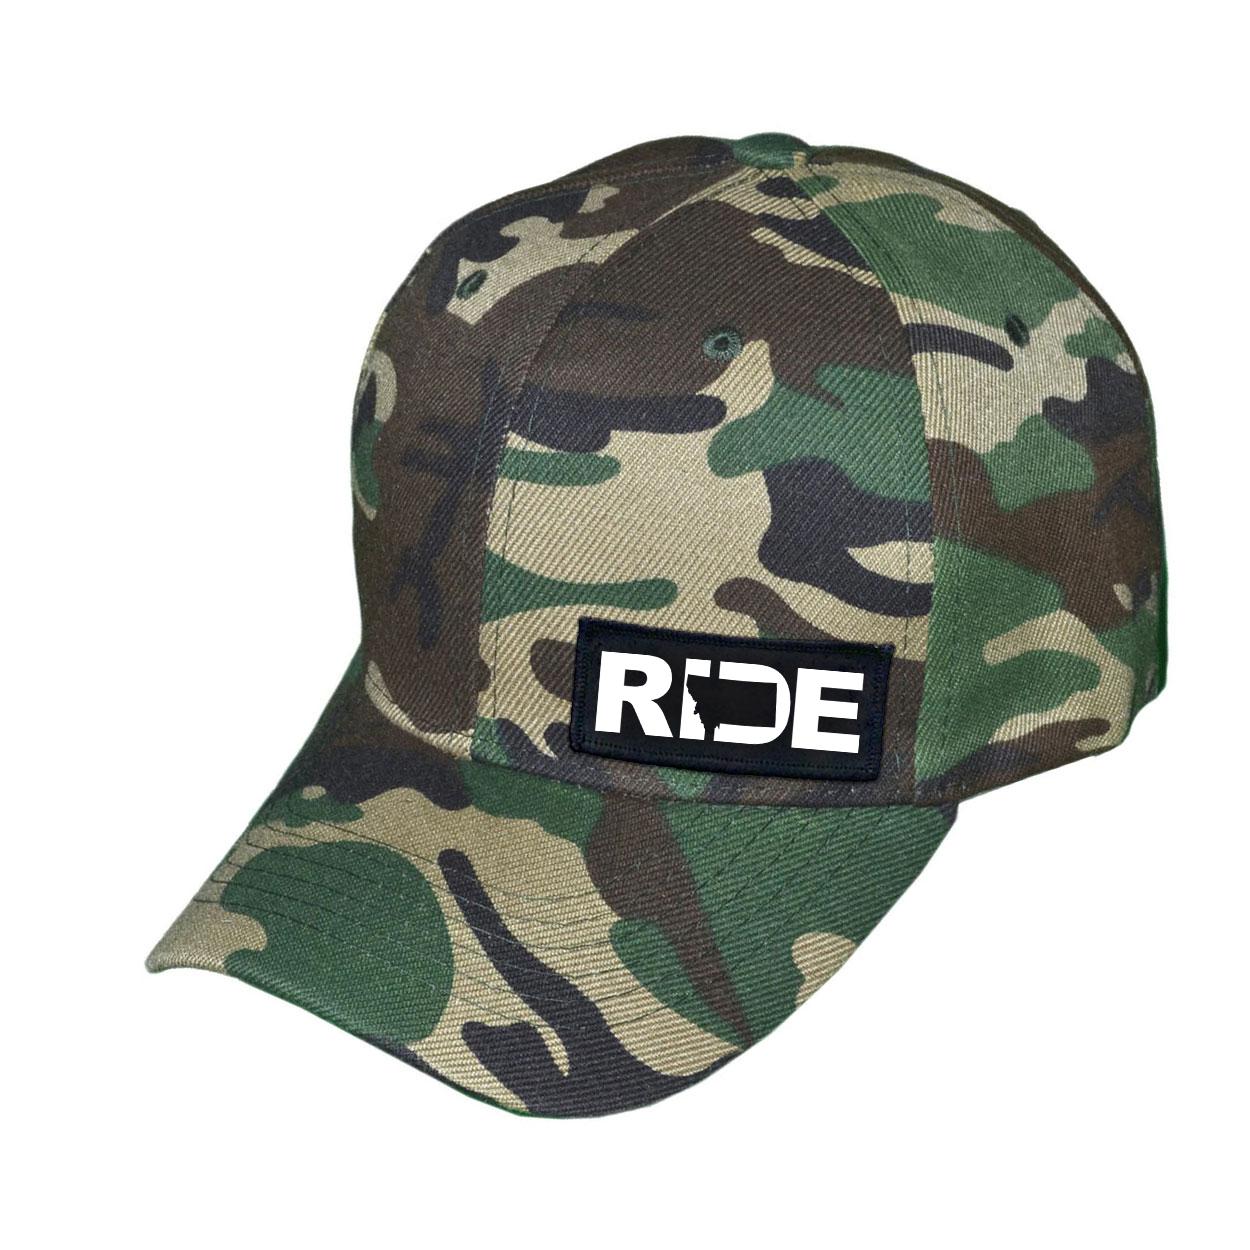 Ride Montana Night Out Woven Patch Hat Camo (White Logo)